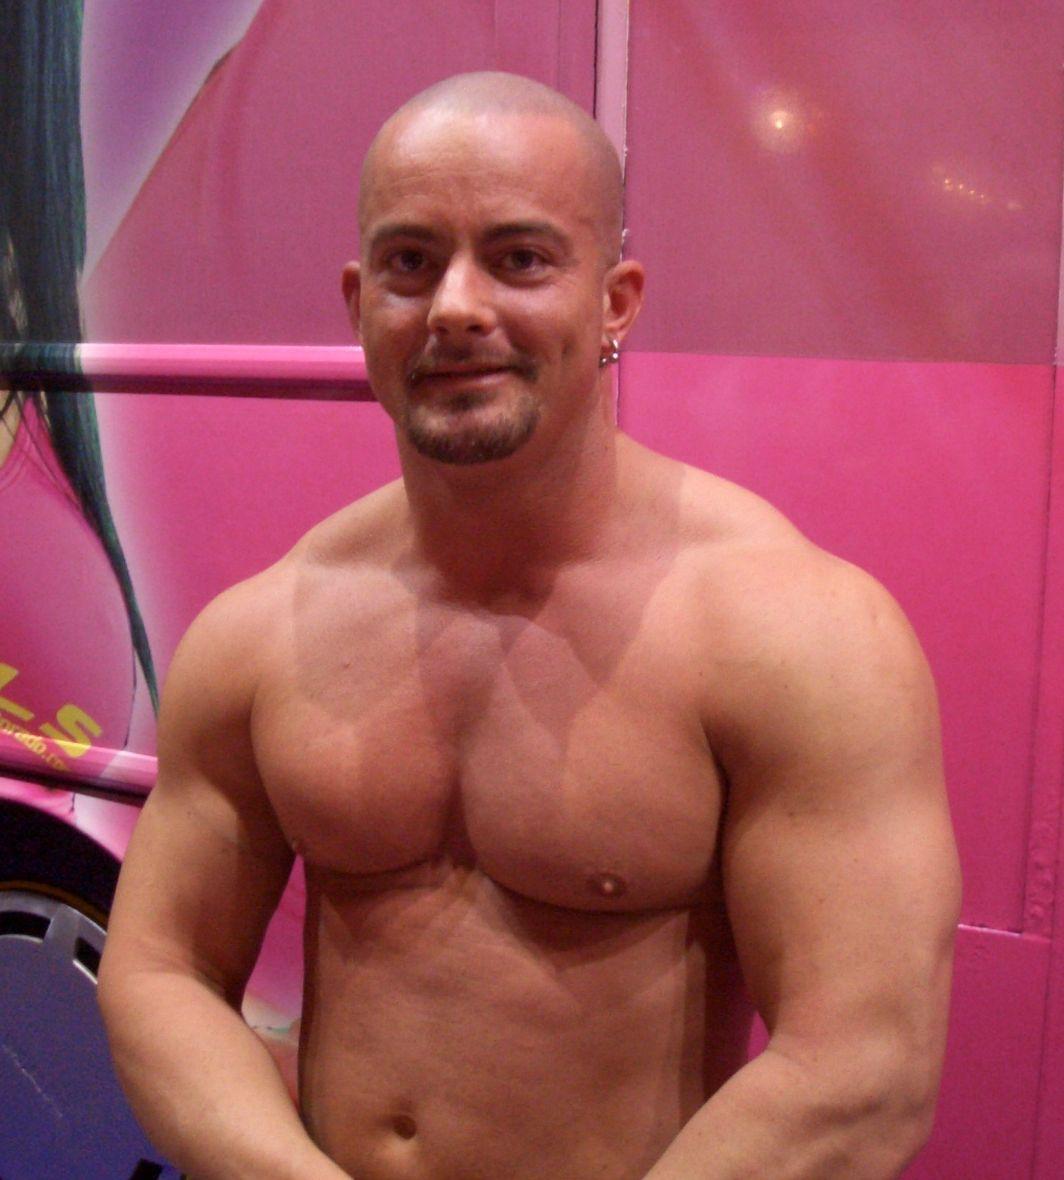 pornodarsteller gay